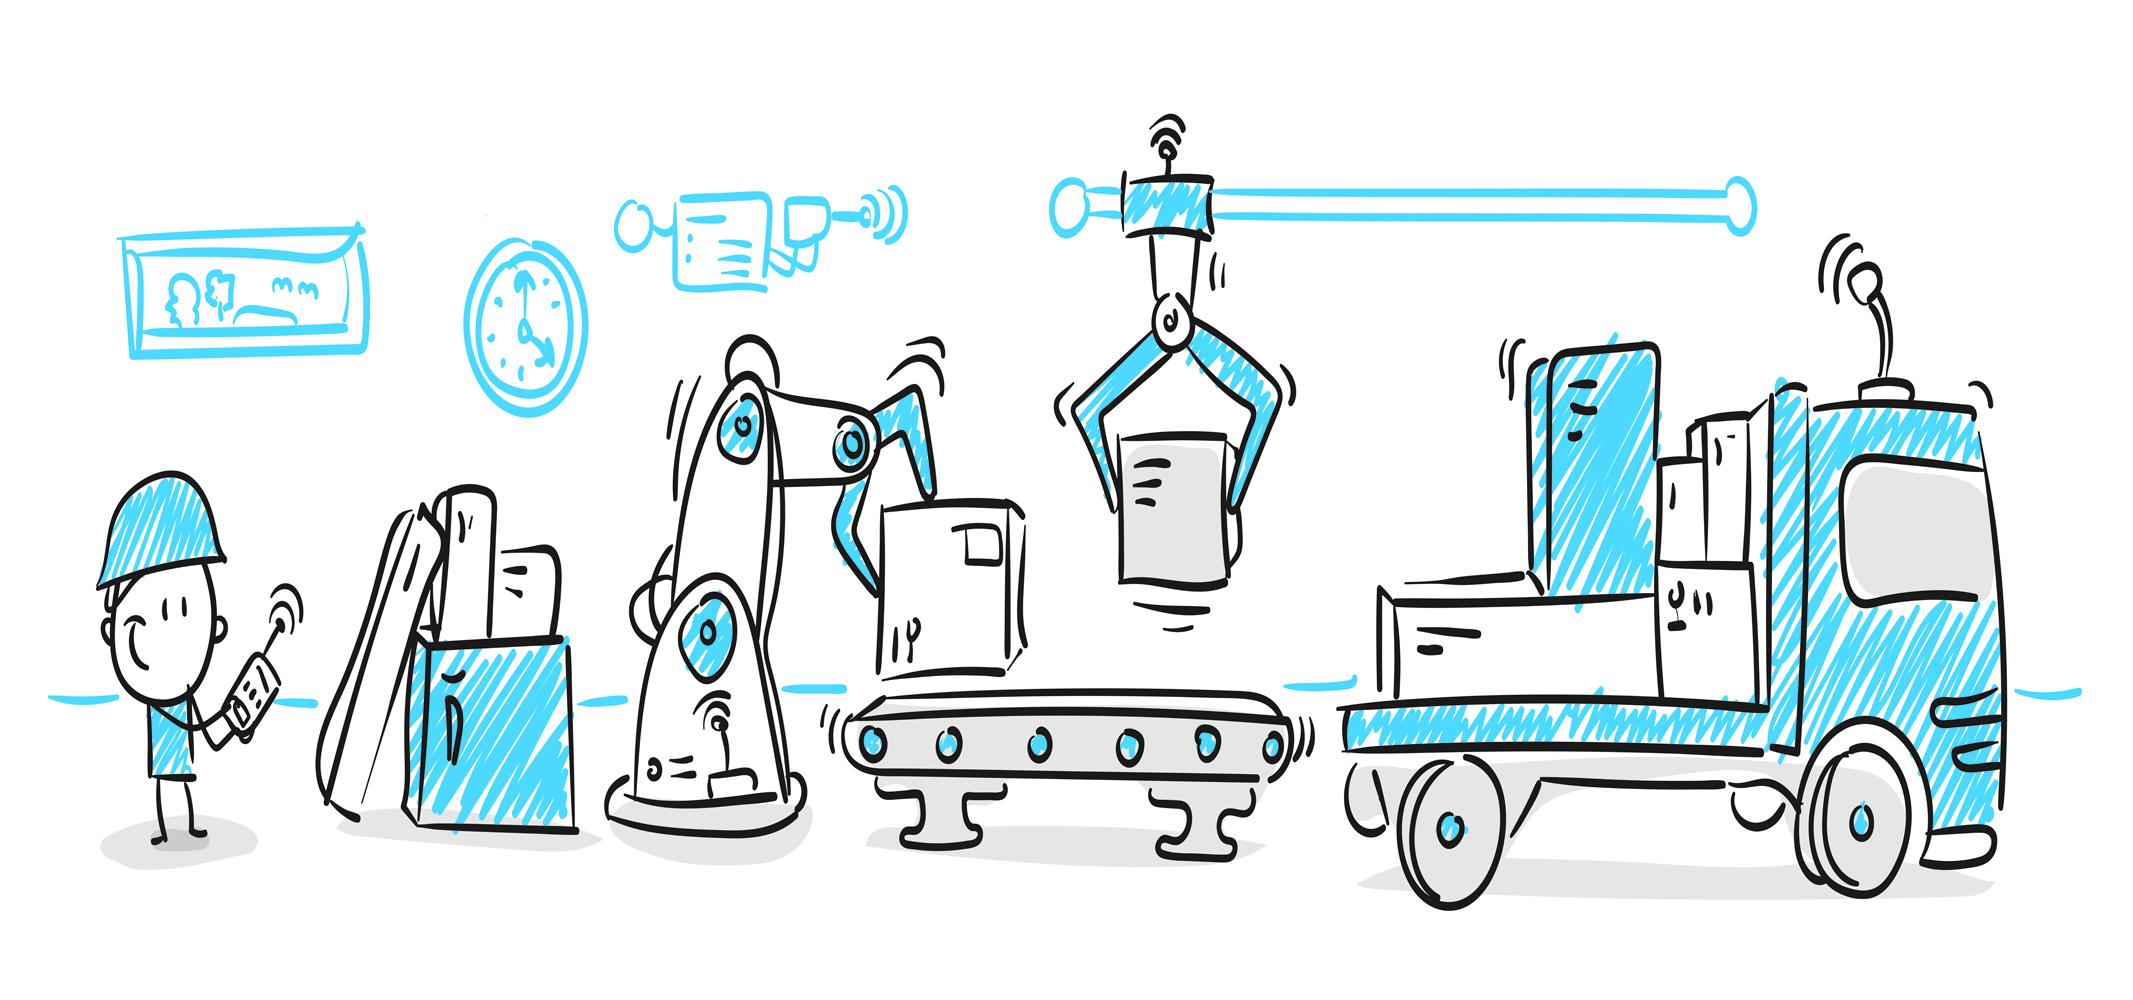 Bild: ©strichfiguren.de/stock.adobe.com